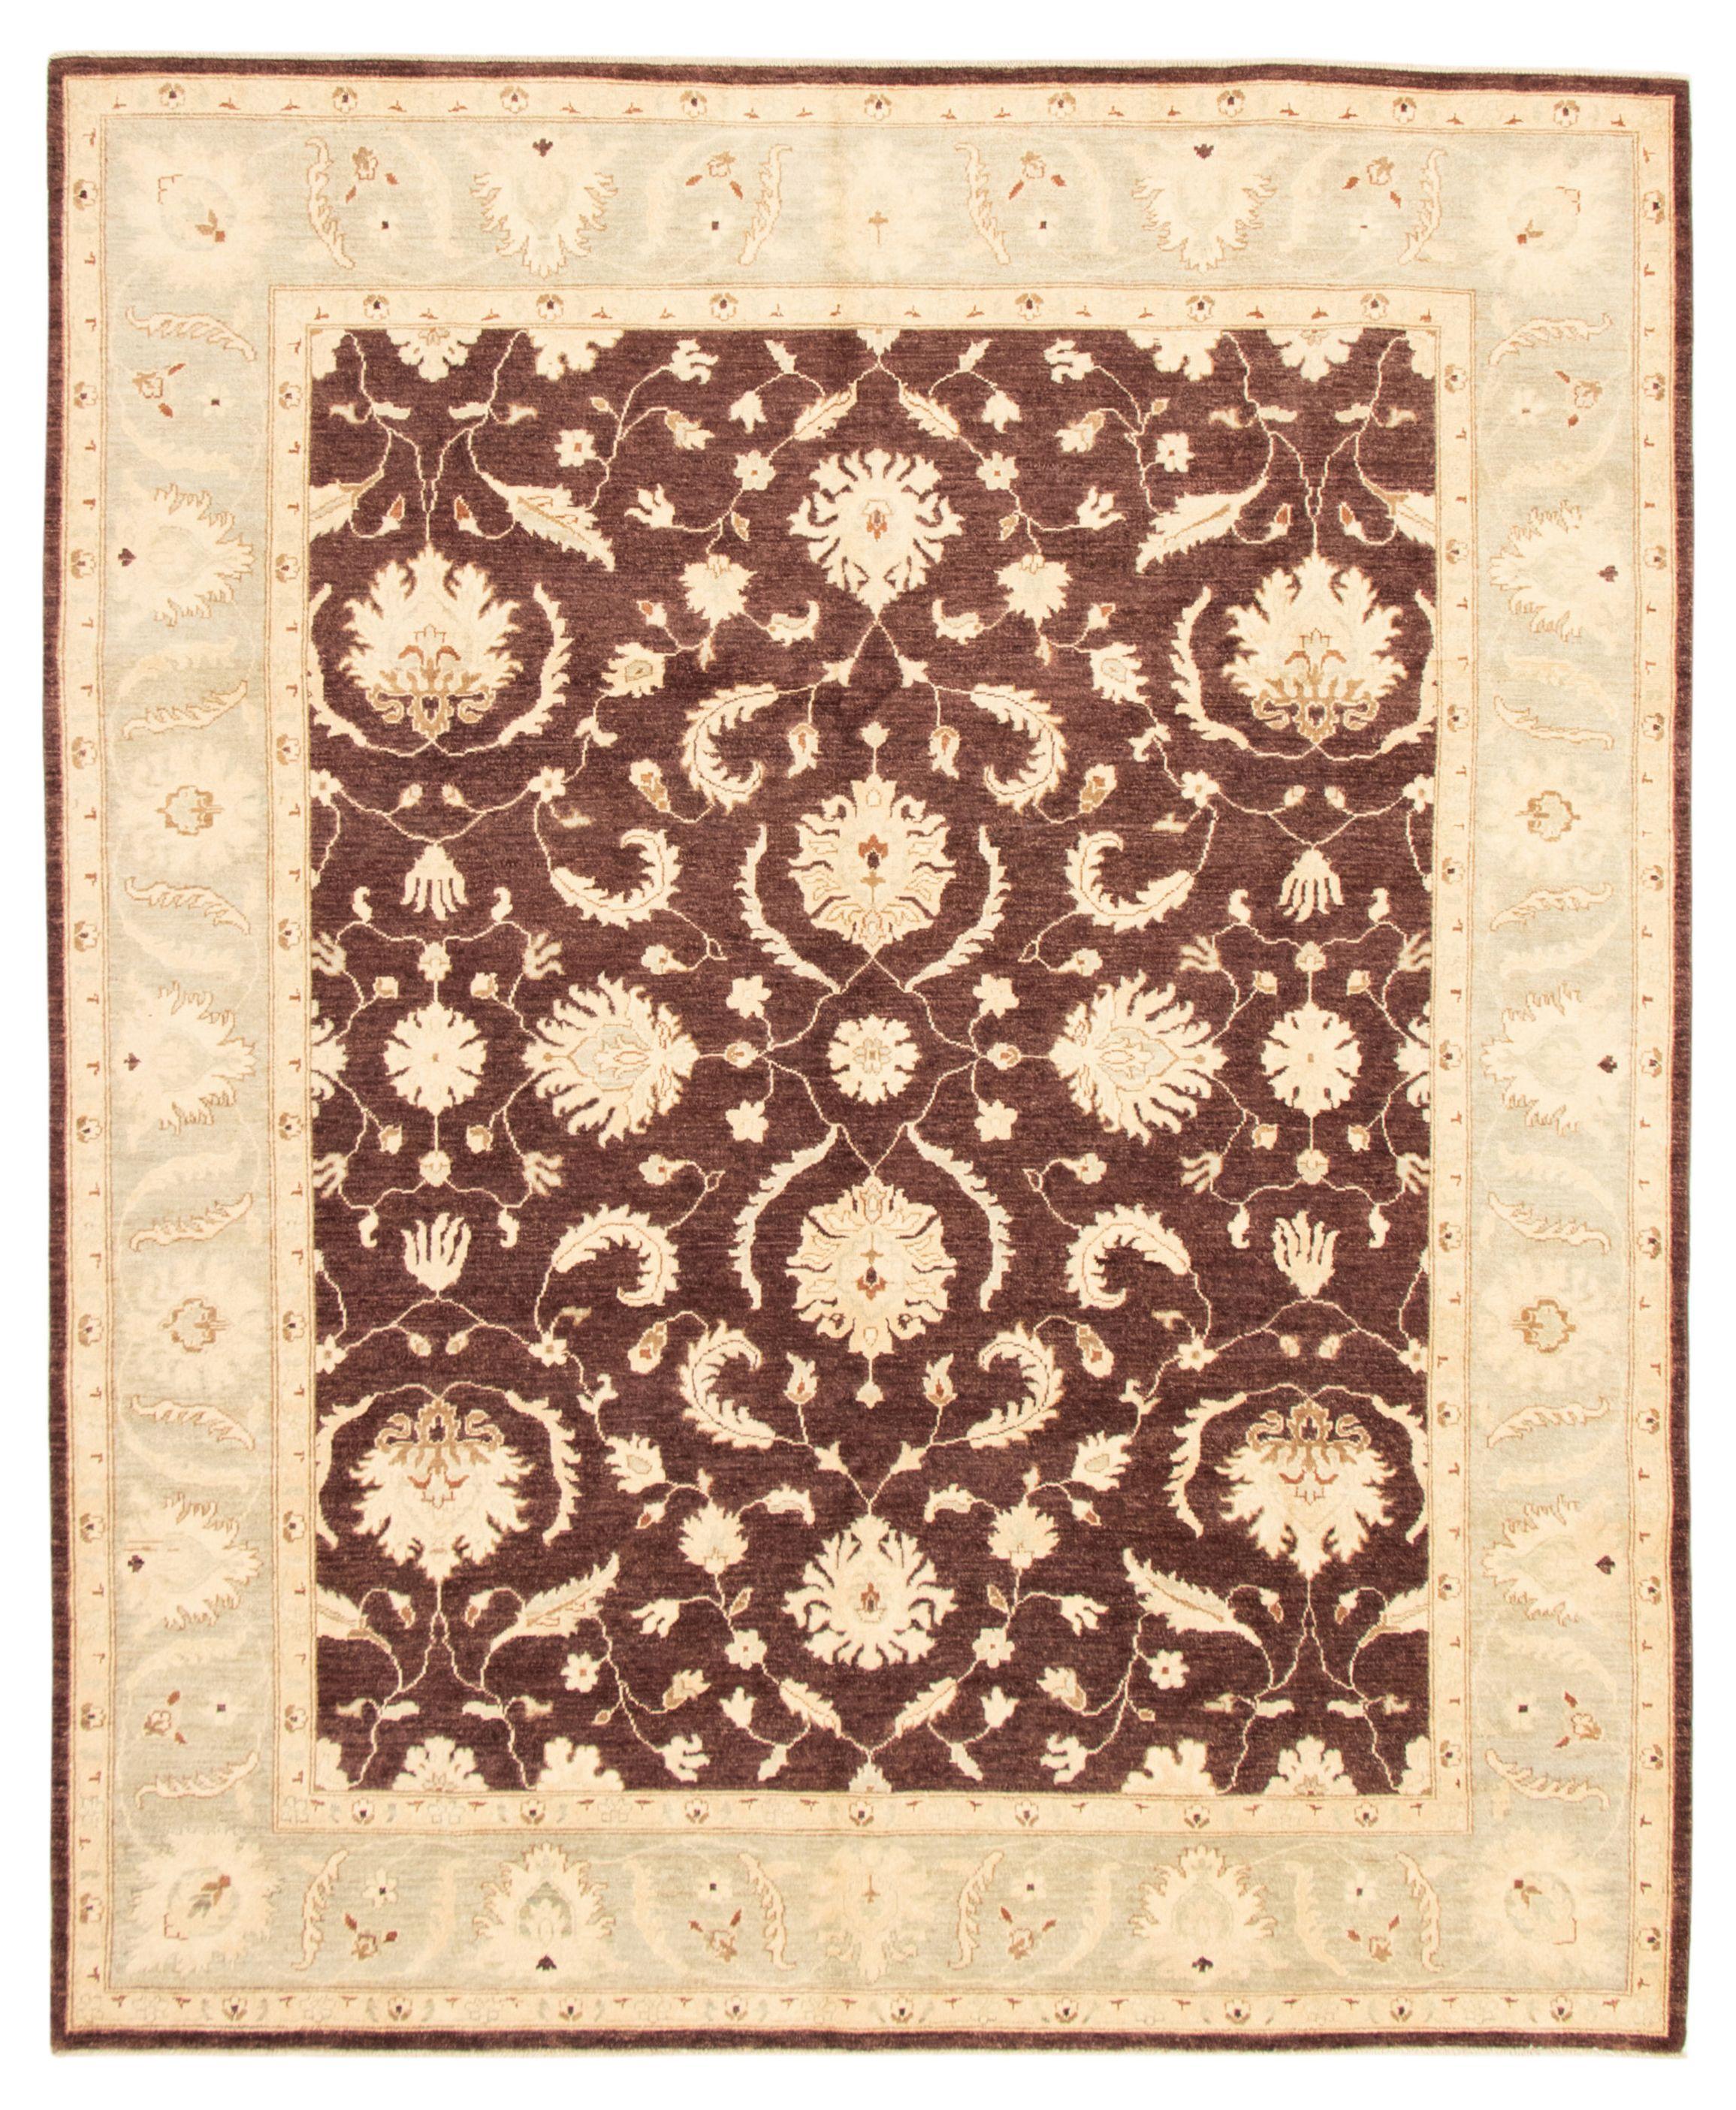 "Hand-knotted Chobi Finest Dark Brown Wool Rug 8'3"" x 9'9"" Size: 8'3"" x 9'9"""